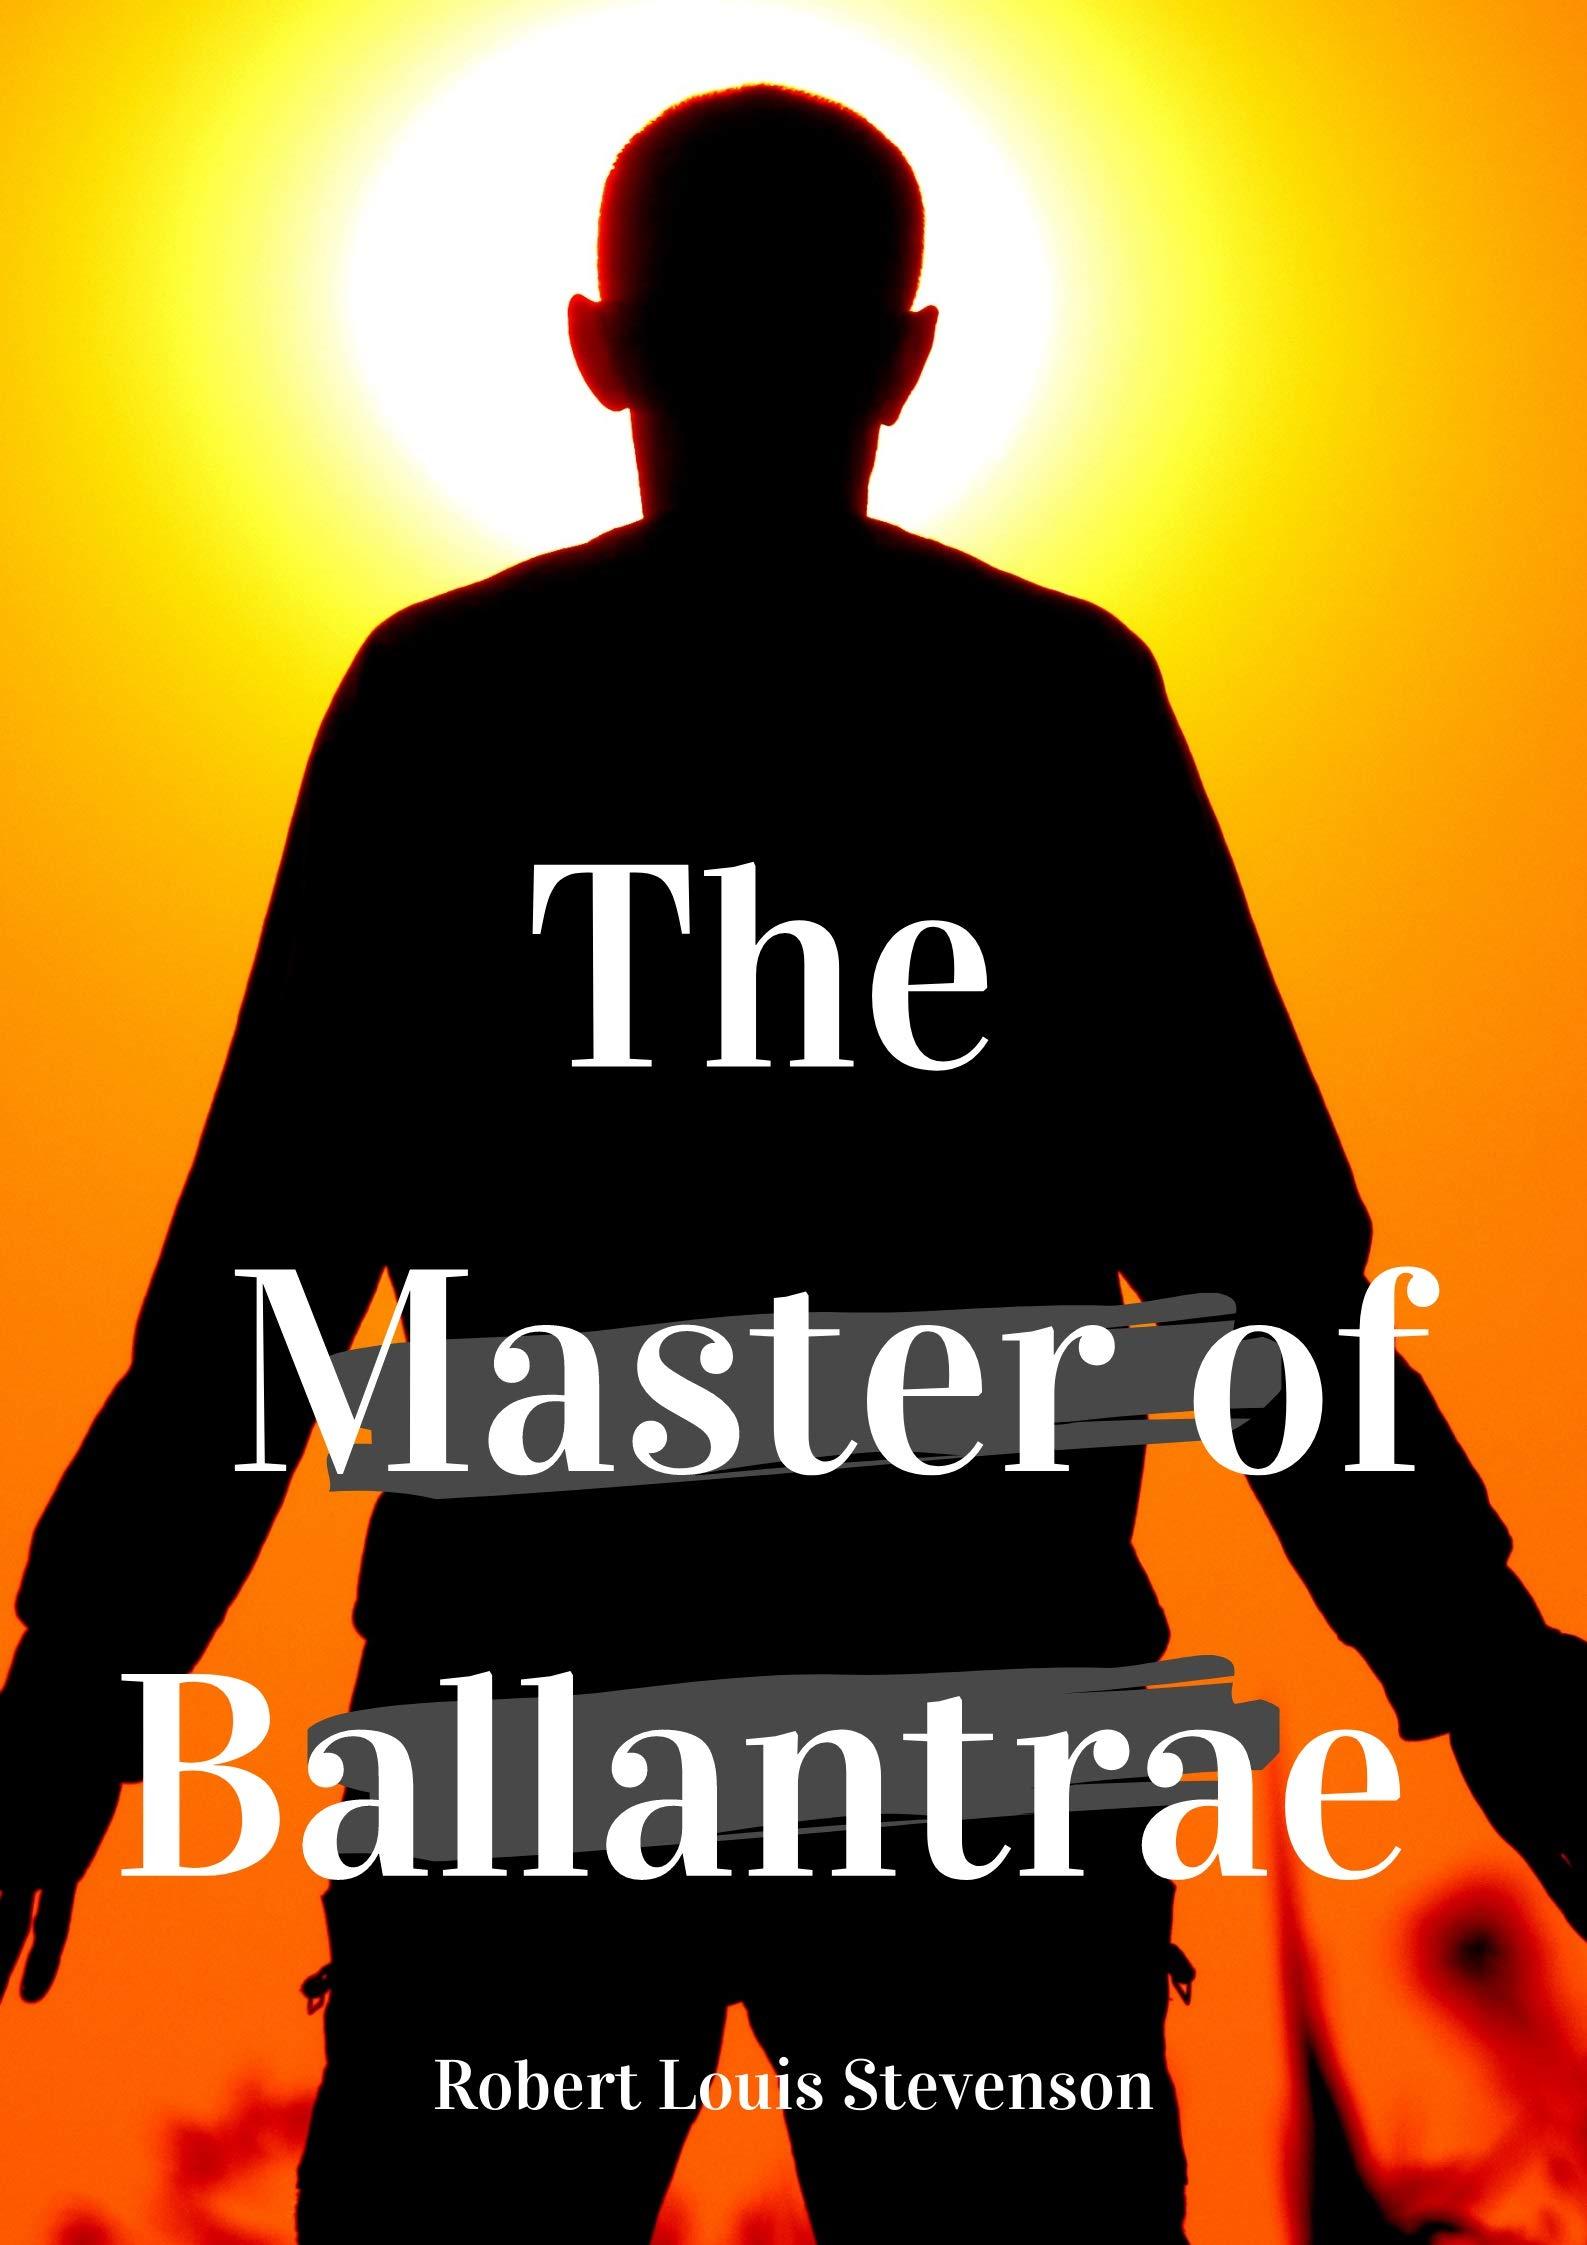 The Master of Ballantrae: Robert Louis Stevenson (Novel, Historical Fiction Novel, Adventure fiction) Annotated